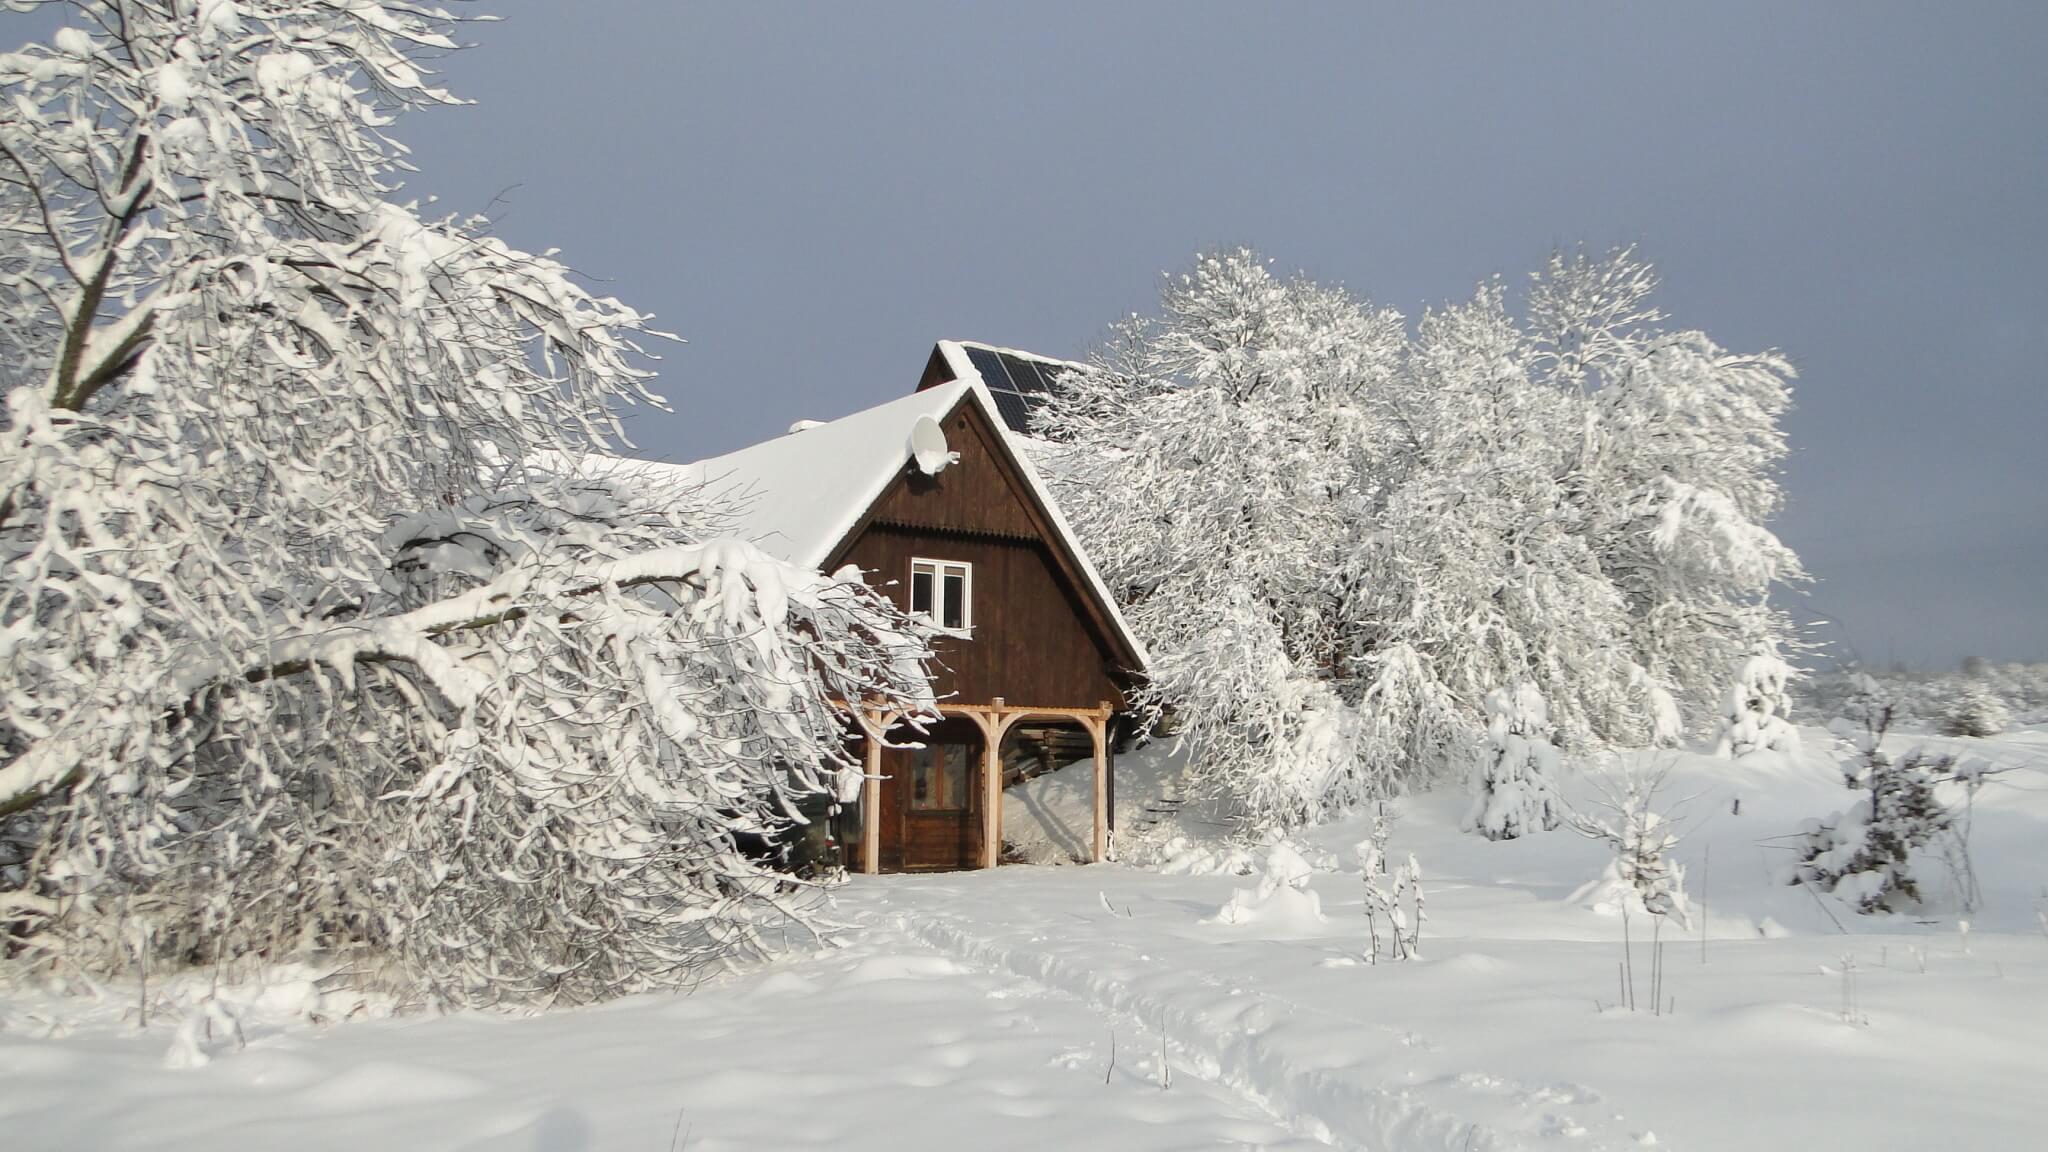 Lutowa zima - śnieżna i mroźna 3